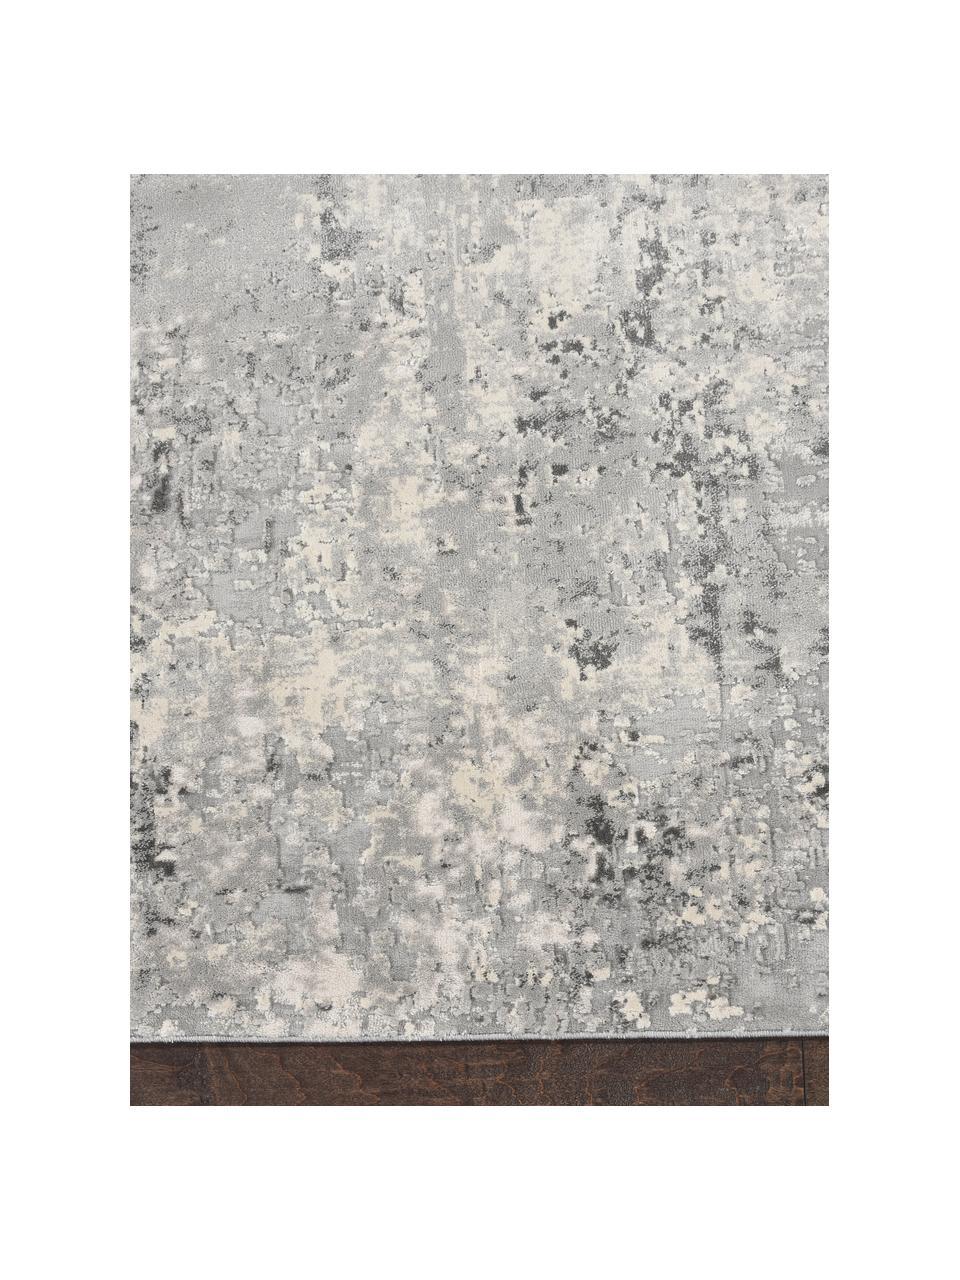 Chodnik Rustic, Szary, beżowy, S 65 x D 230 cm